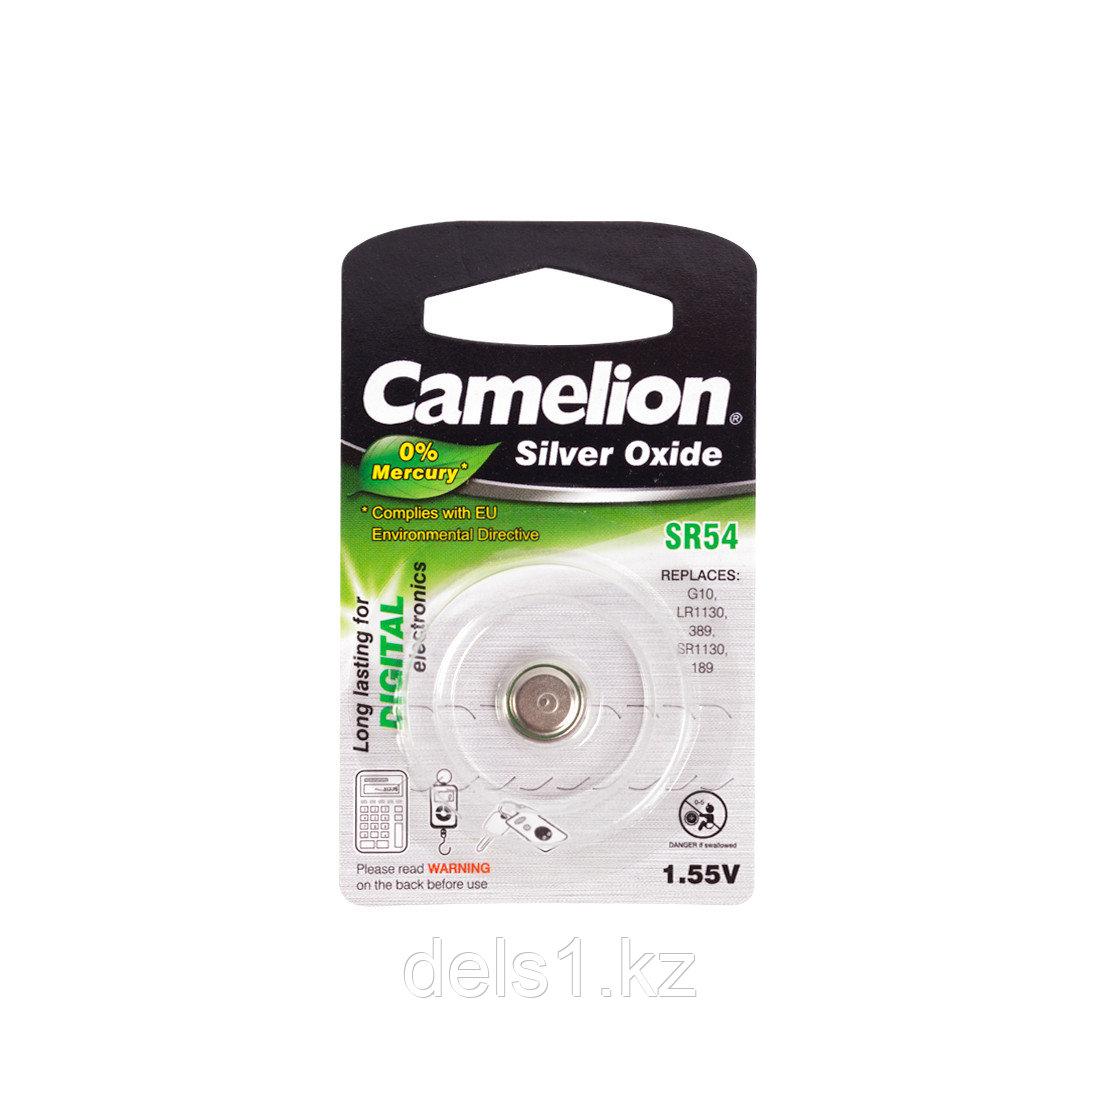 Батарейка, CAMELION, SR54-BP1(0%Hg) , Silver Oxide, 1.55V, 0% Ртути, 1 шт., Блистер